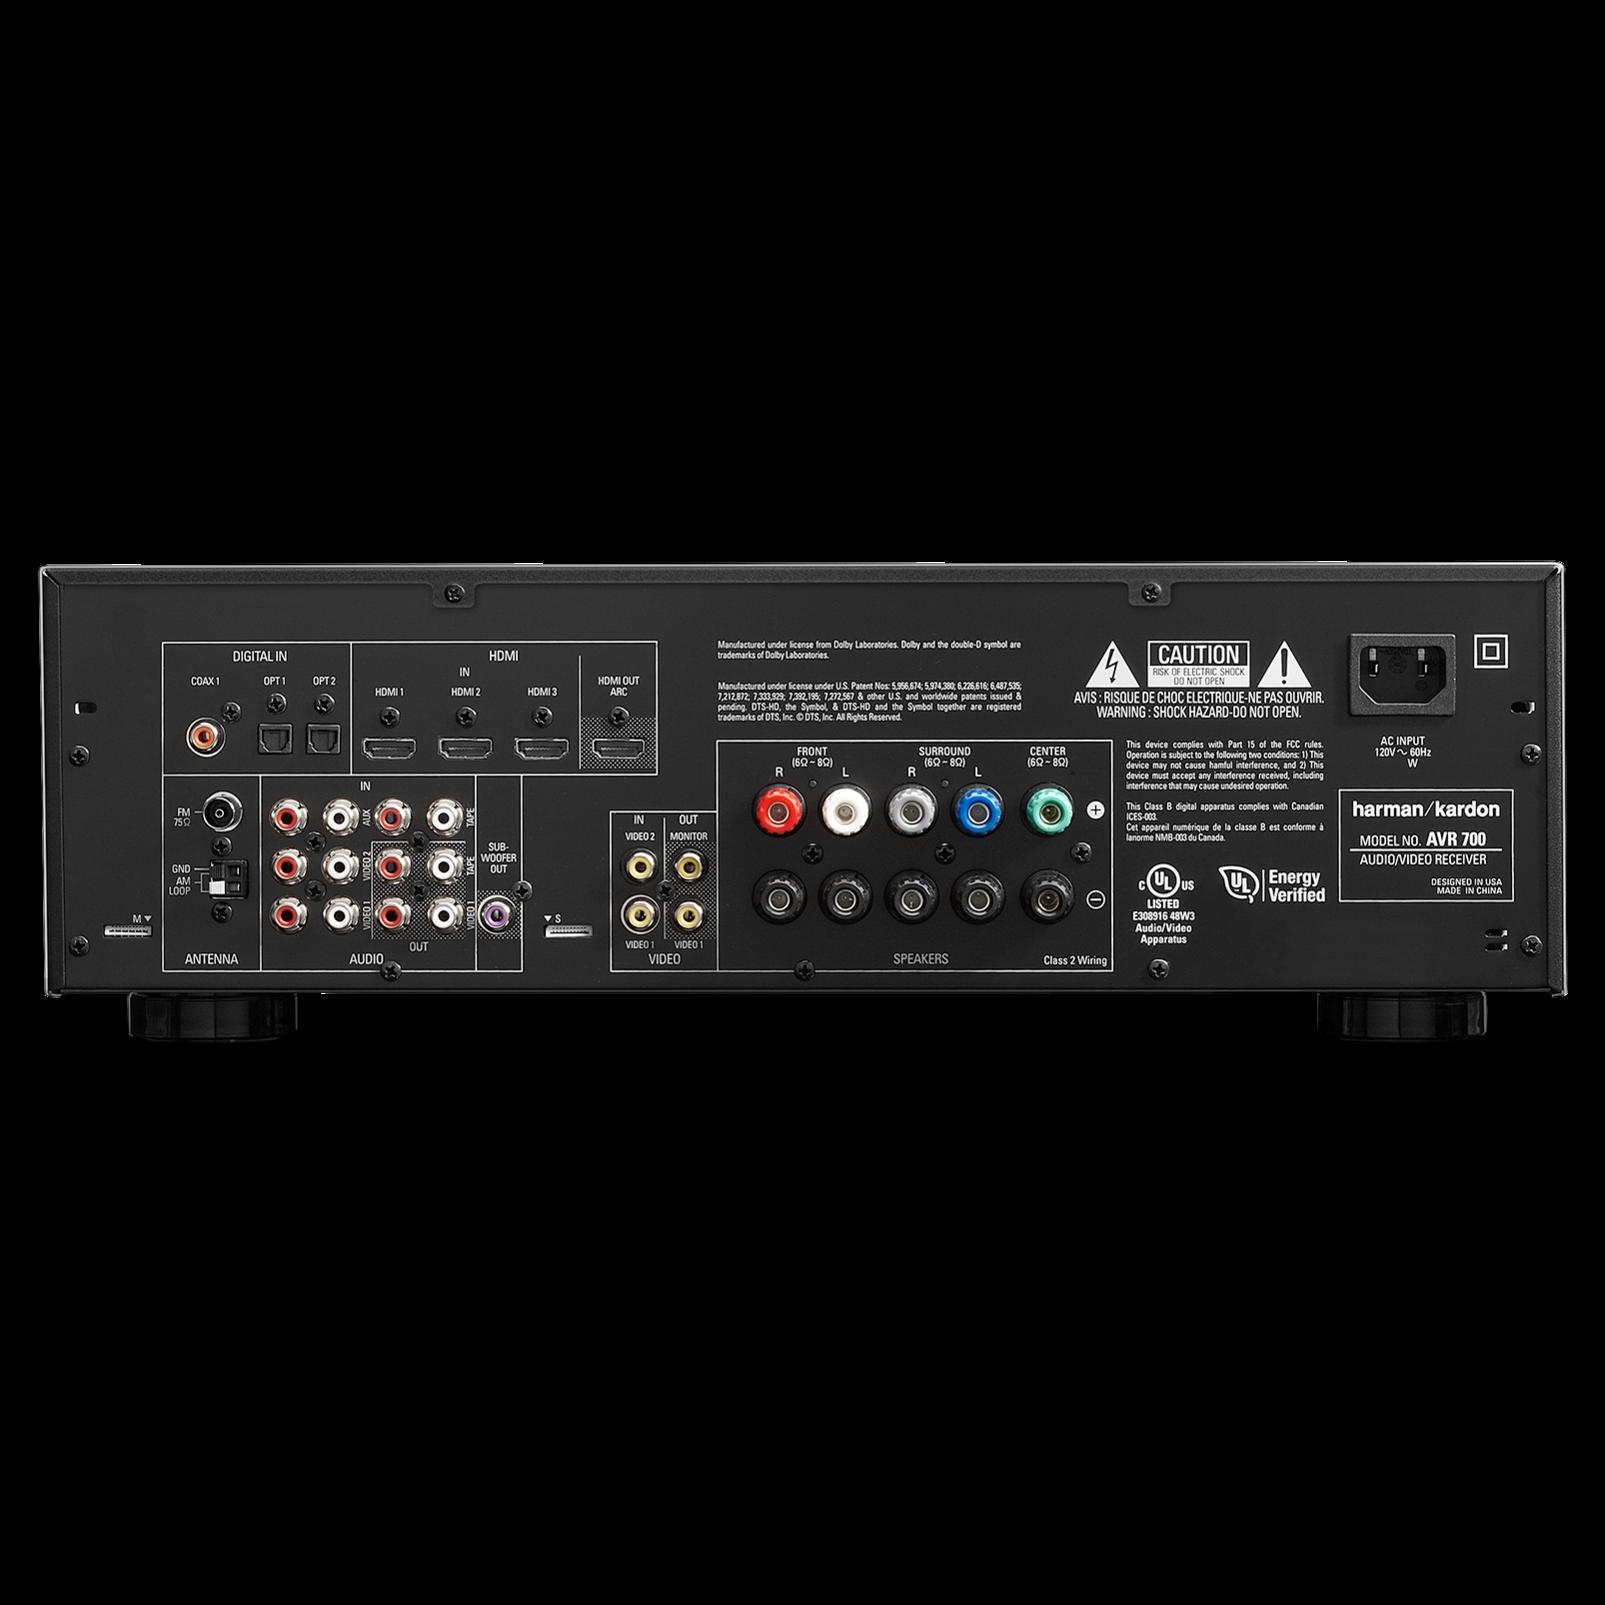 AVR 700